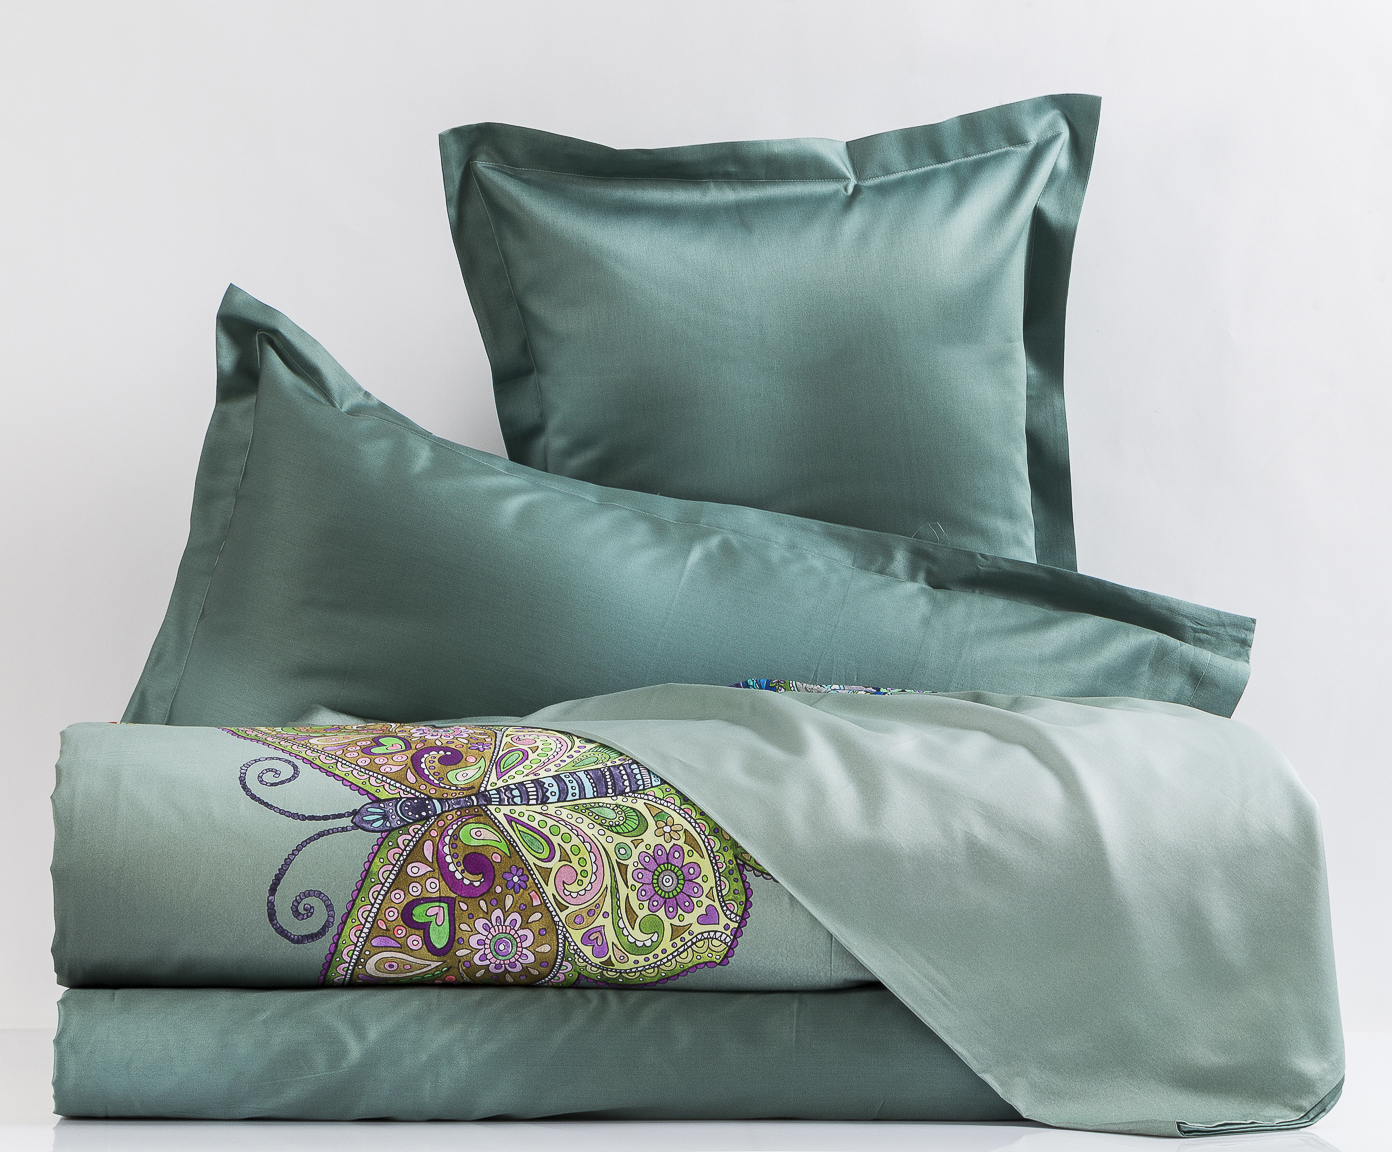 Комплекты Постельное белье 1.5 спальное Mirabello Mariposa зеленое postelnoe-belie-mirabello-mariposa-zelenoe-italiya.jpg